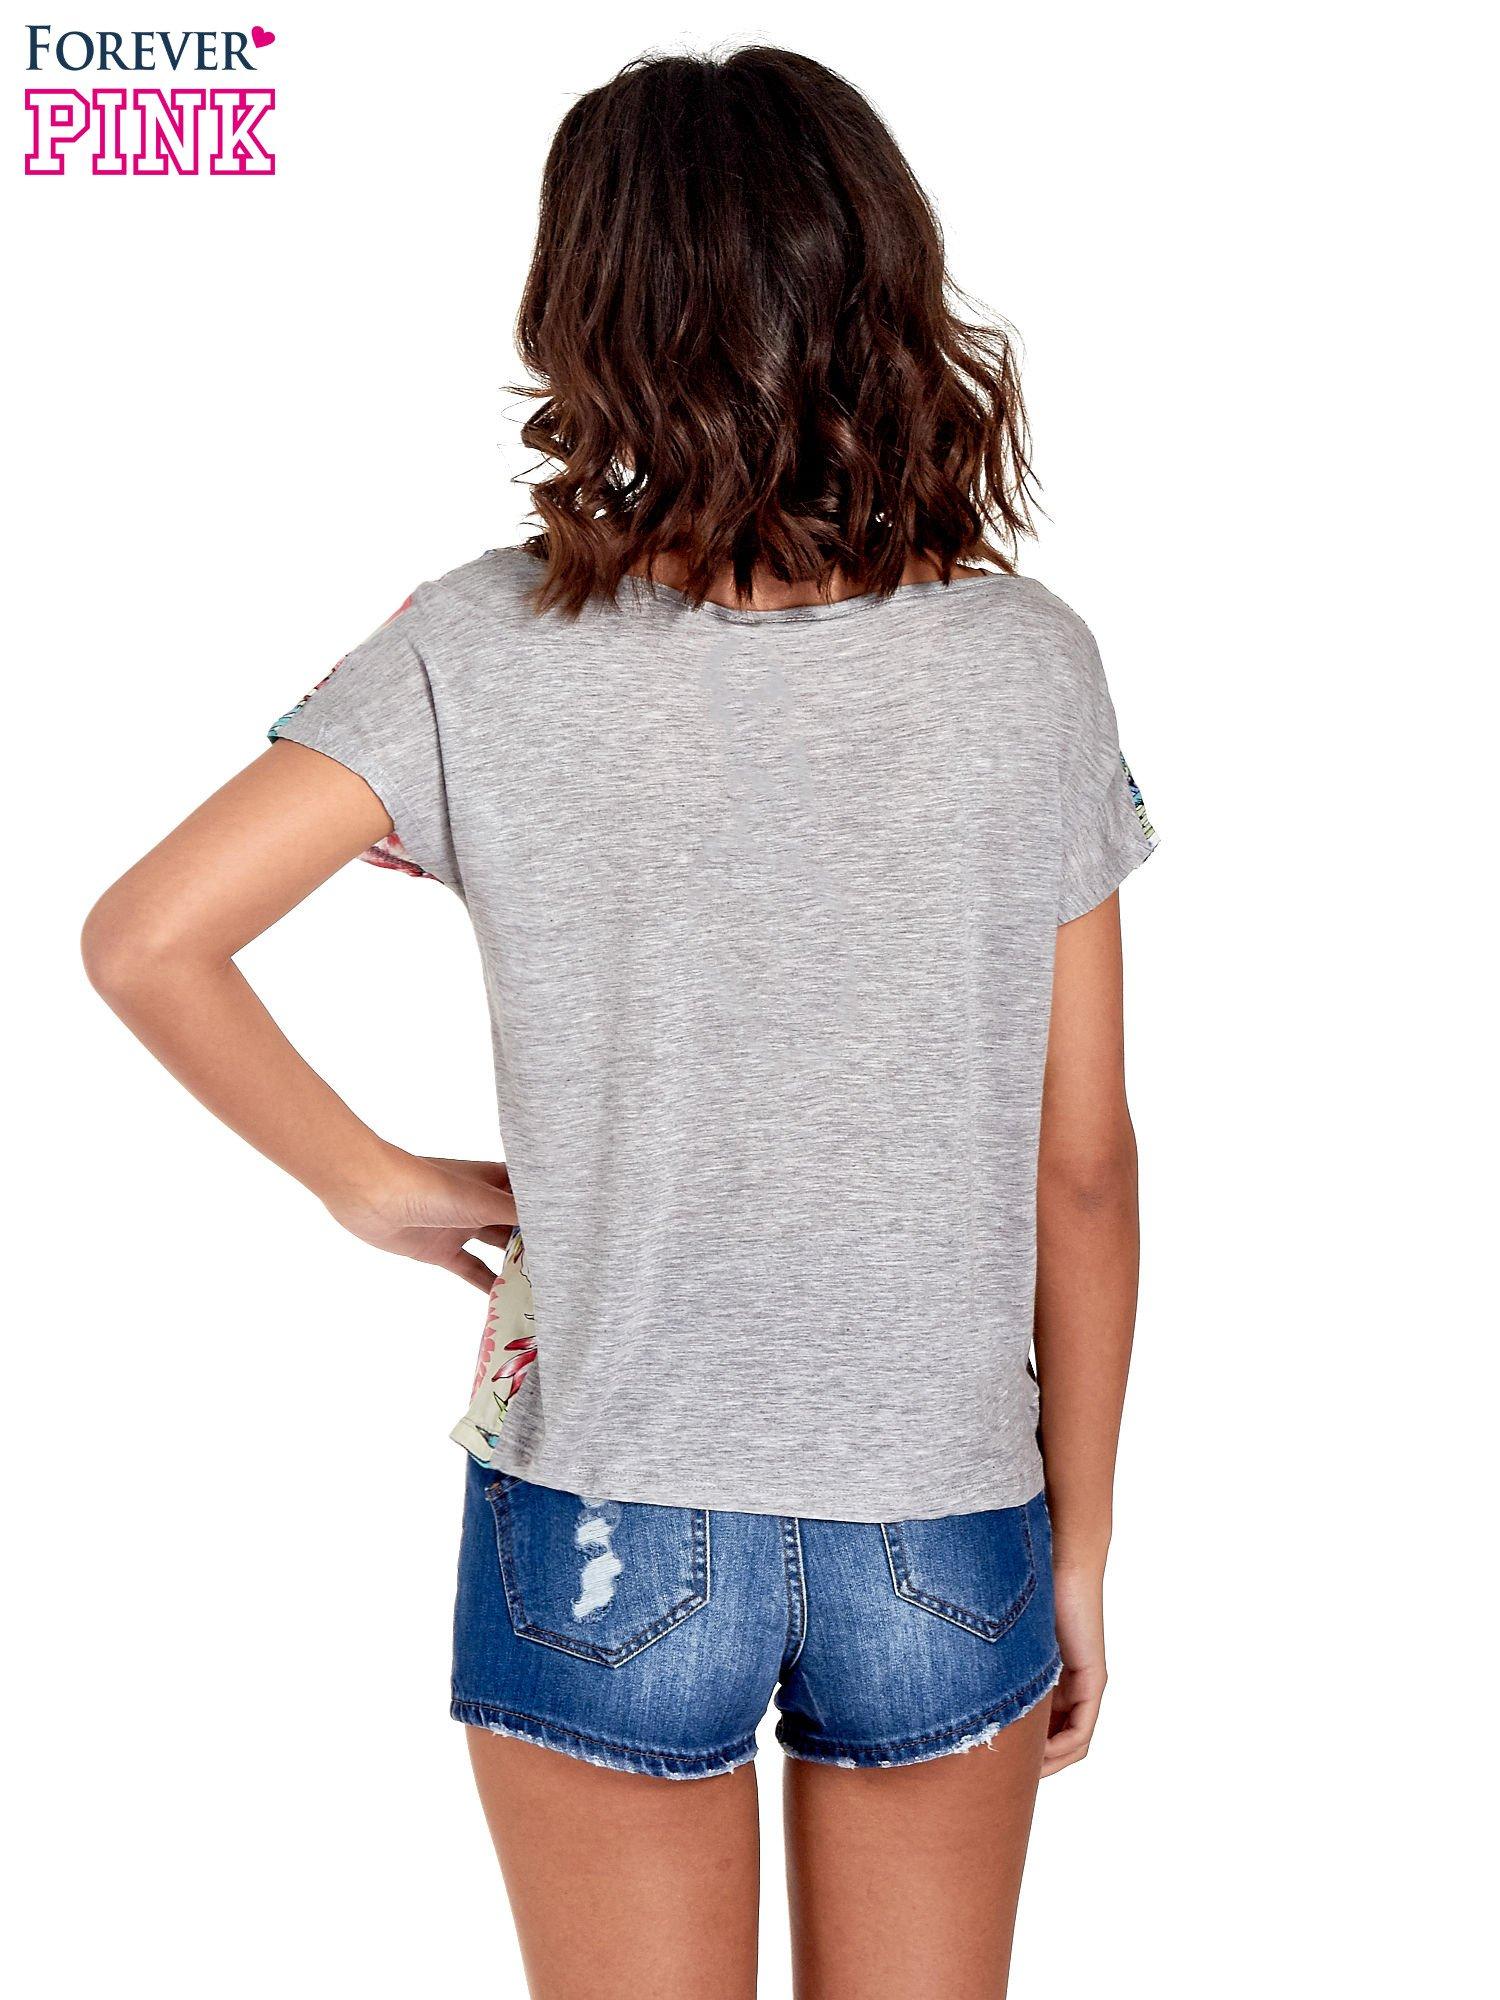 Szary t-shirt z nadrukiem floral print                                  zdj.                                  4